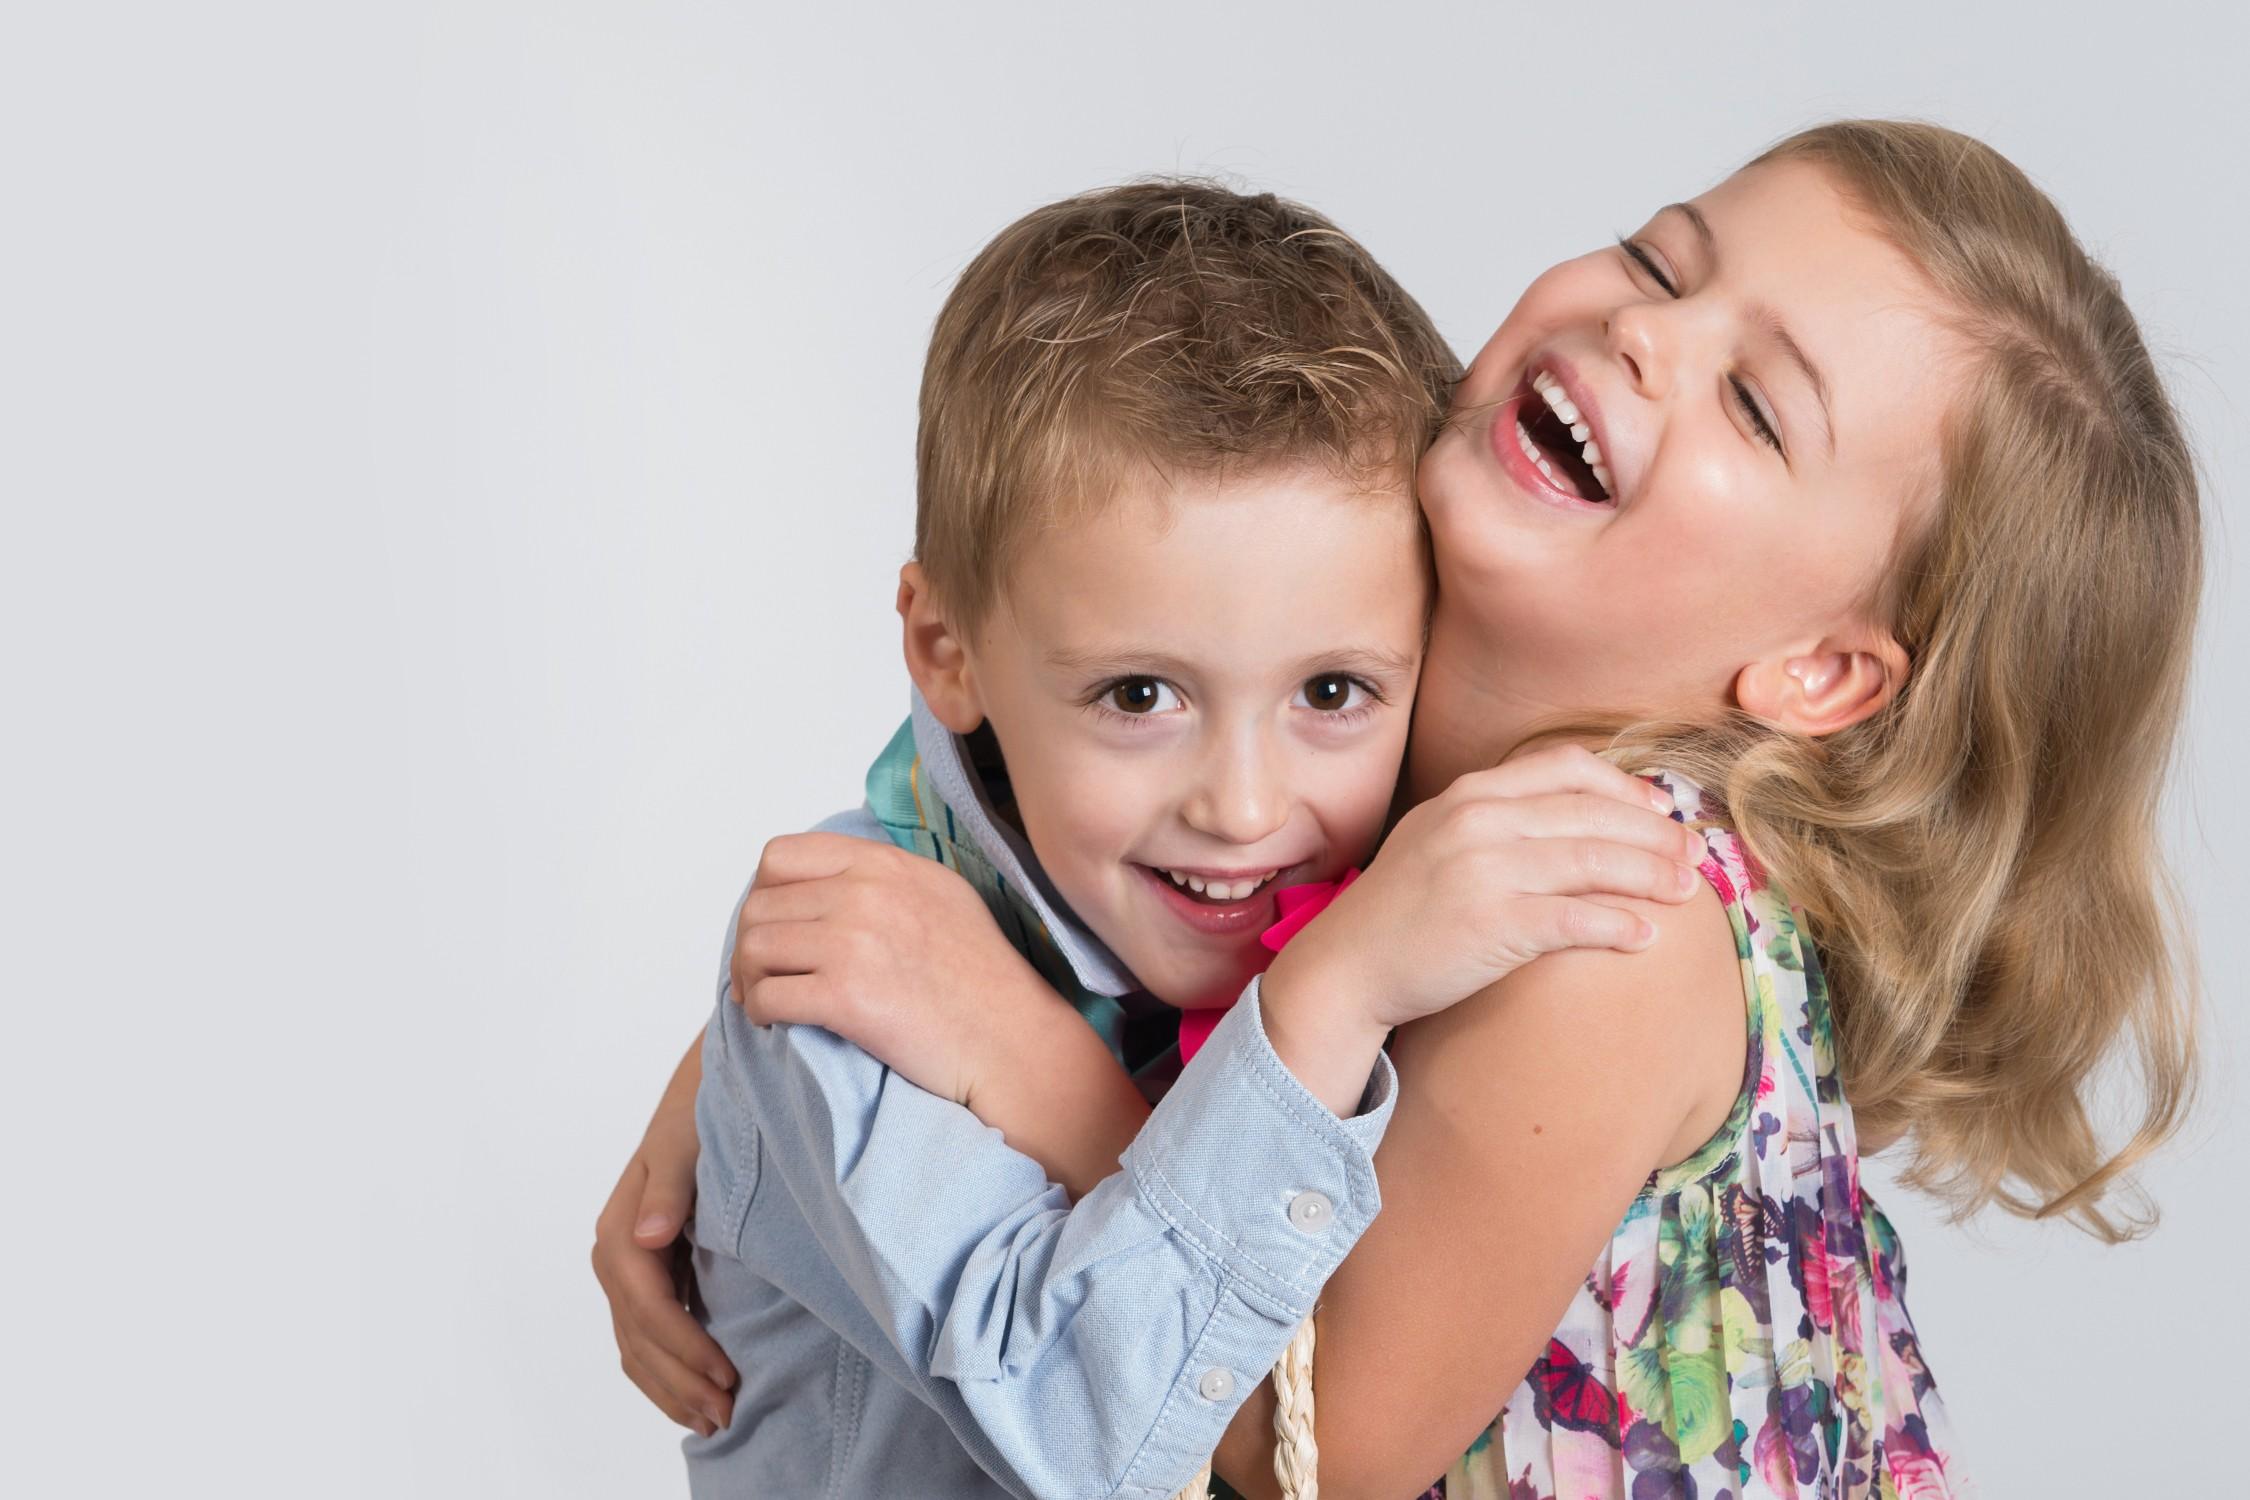 Kinderbilder mit Spaßfaktor